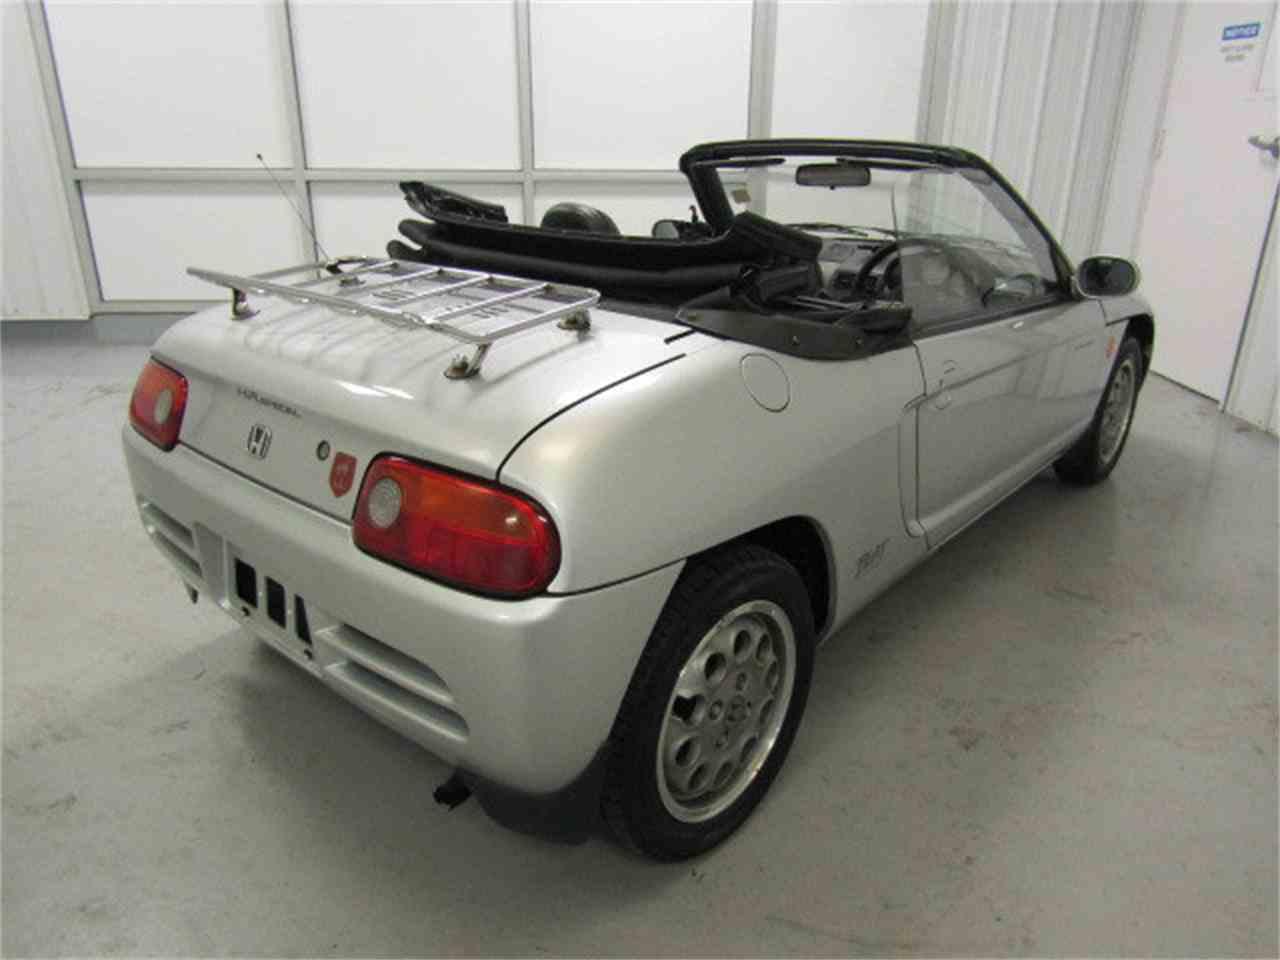 Large Picture of 1991 Honda Beat - $6,990.00 - K89C